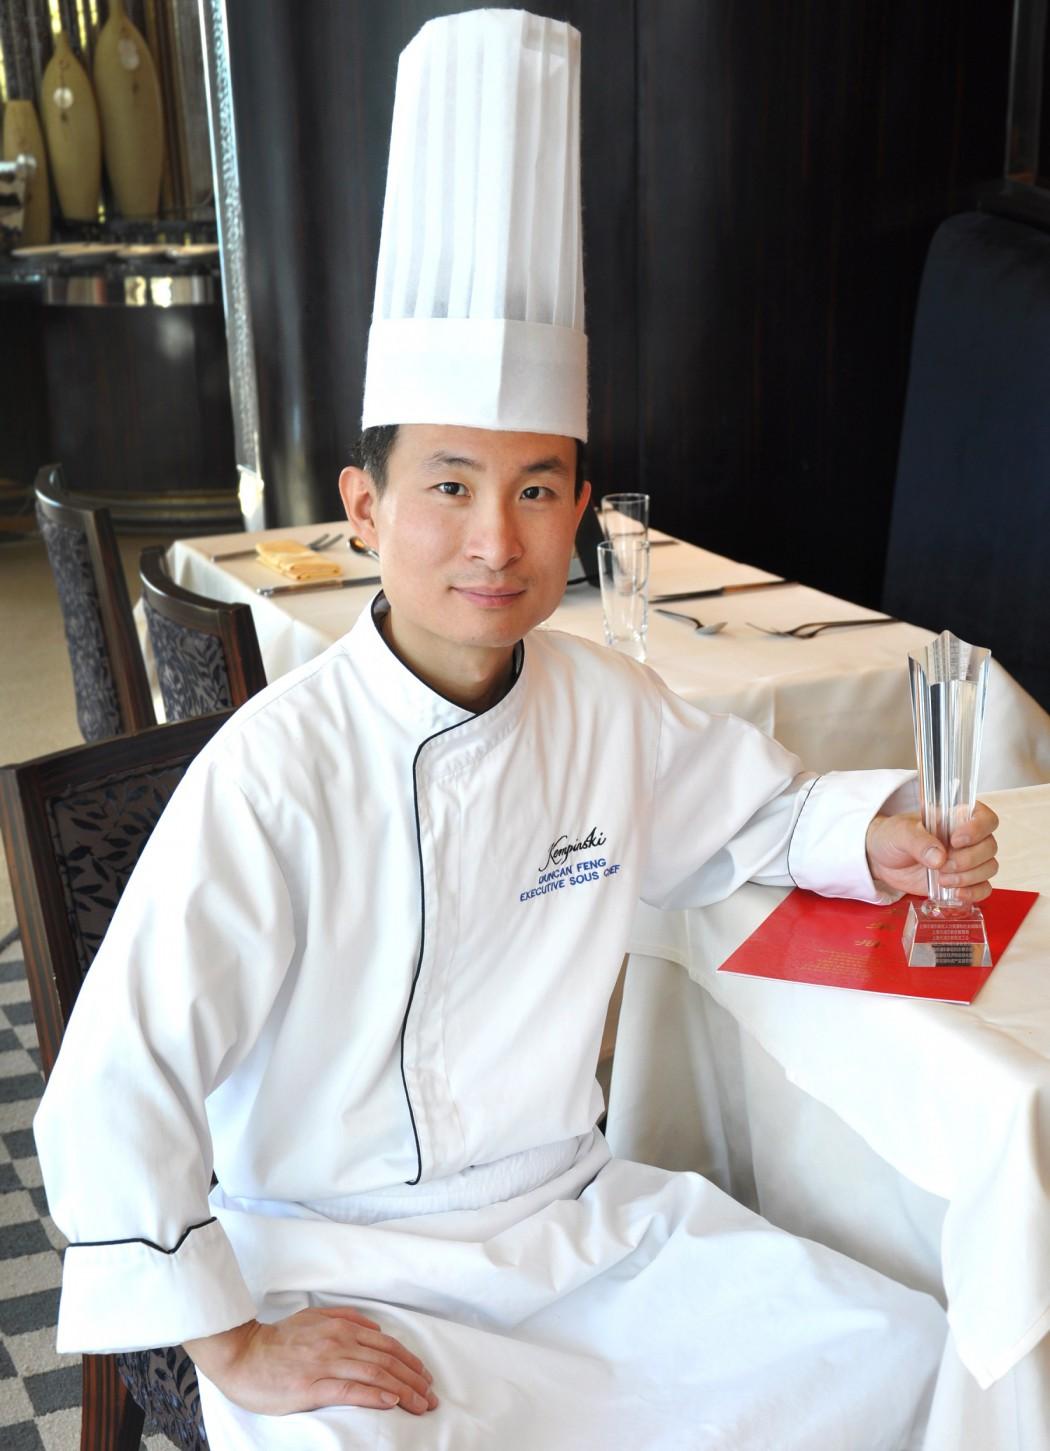 Mein Schiff Gastkoch: Duncan Feng vom Kempinski Grand Hotel Shanghai